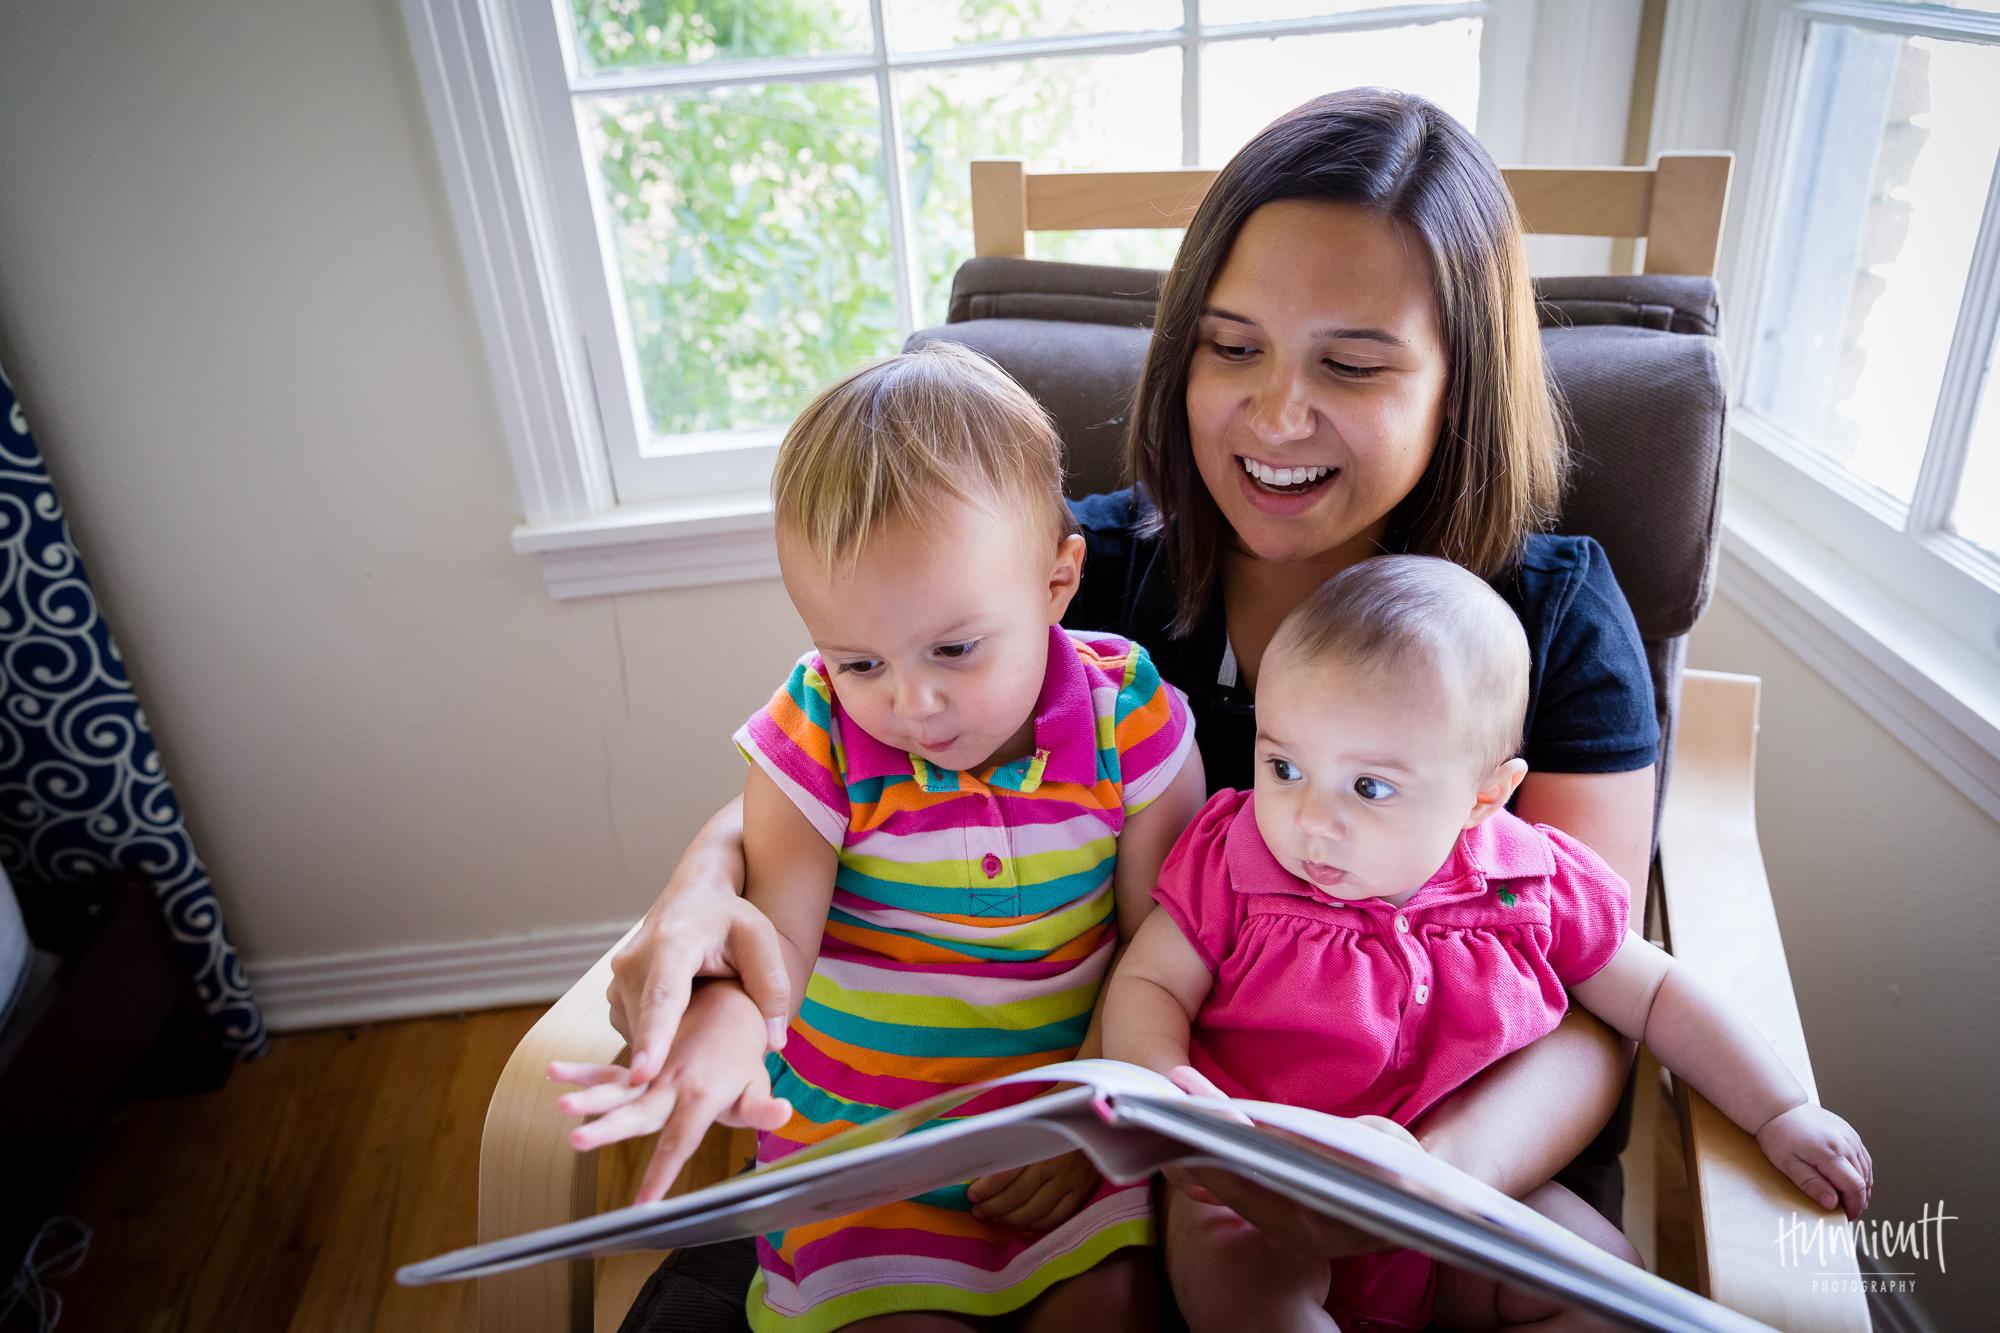 Indoor-Lifestyle-Texas-Family-Hunnicutt-8